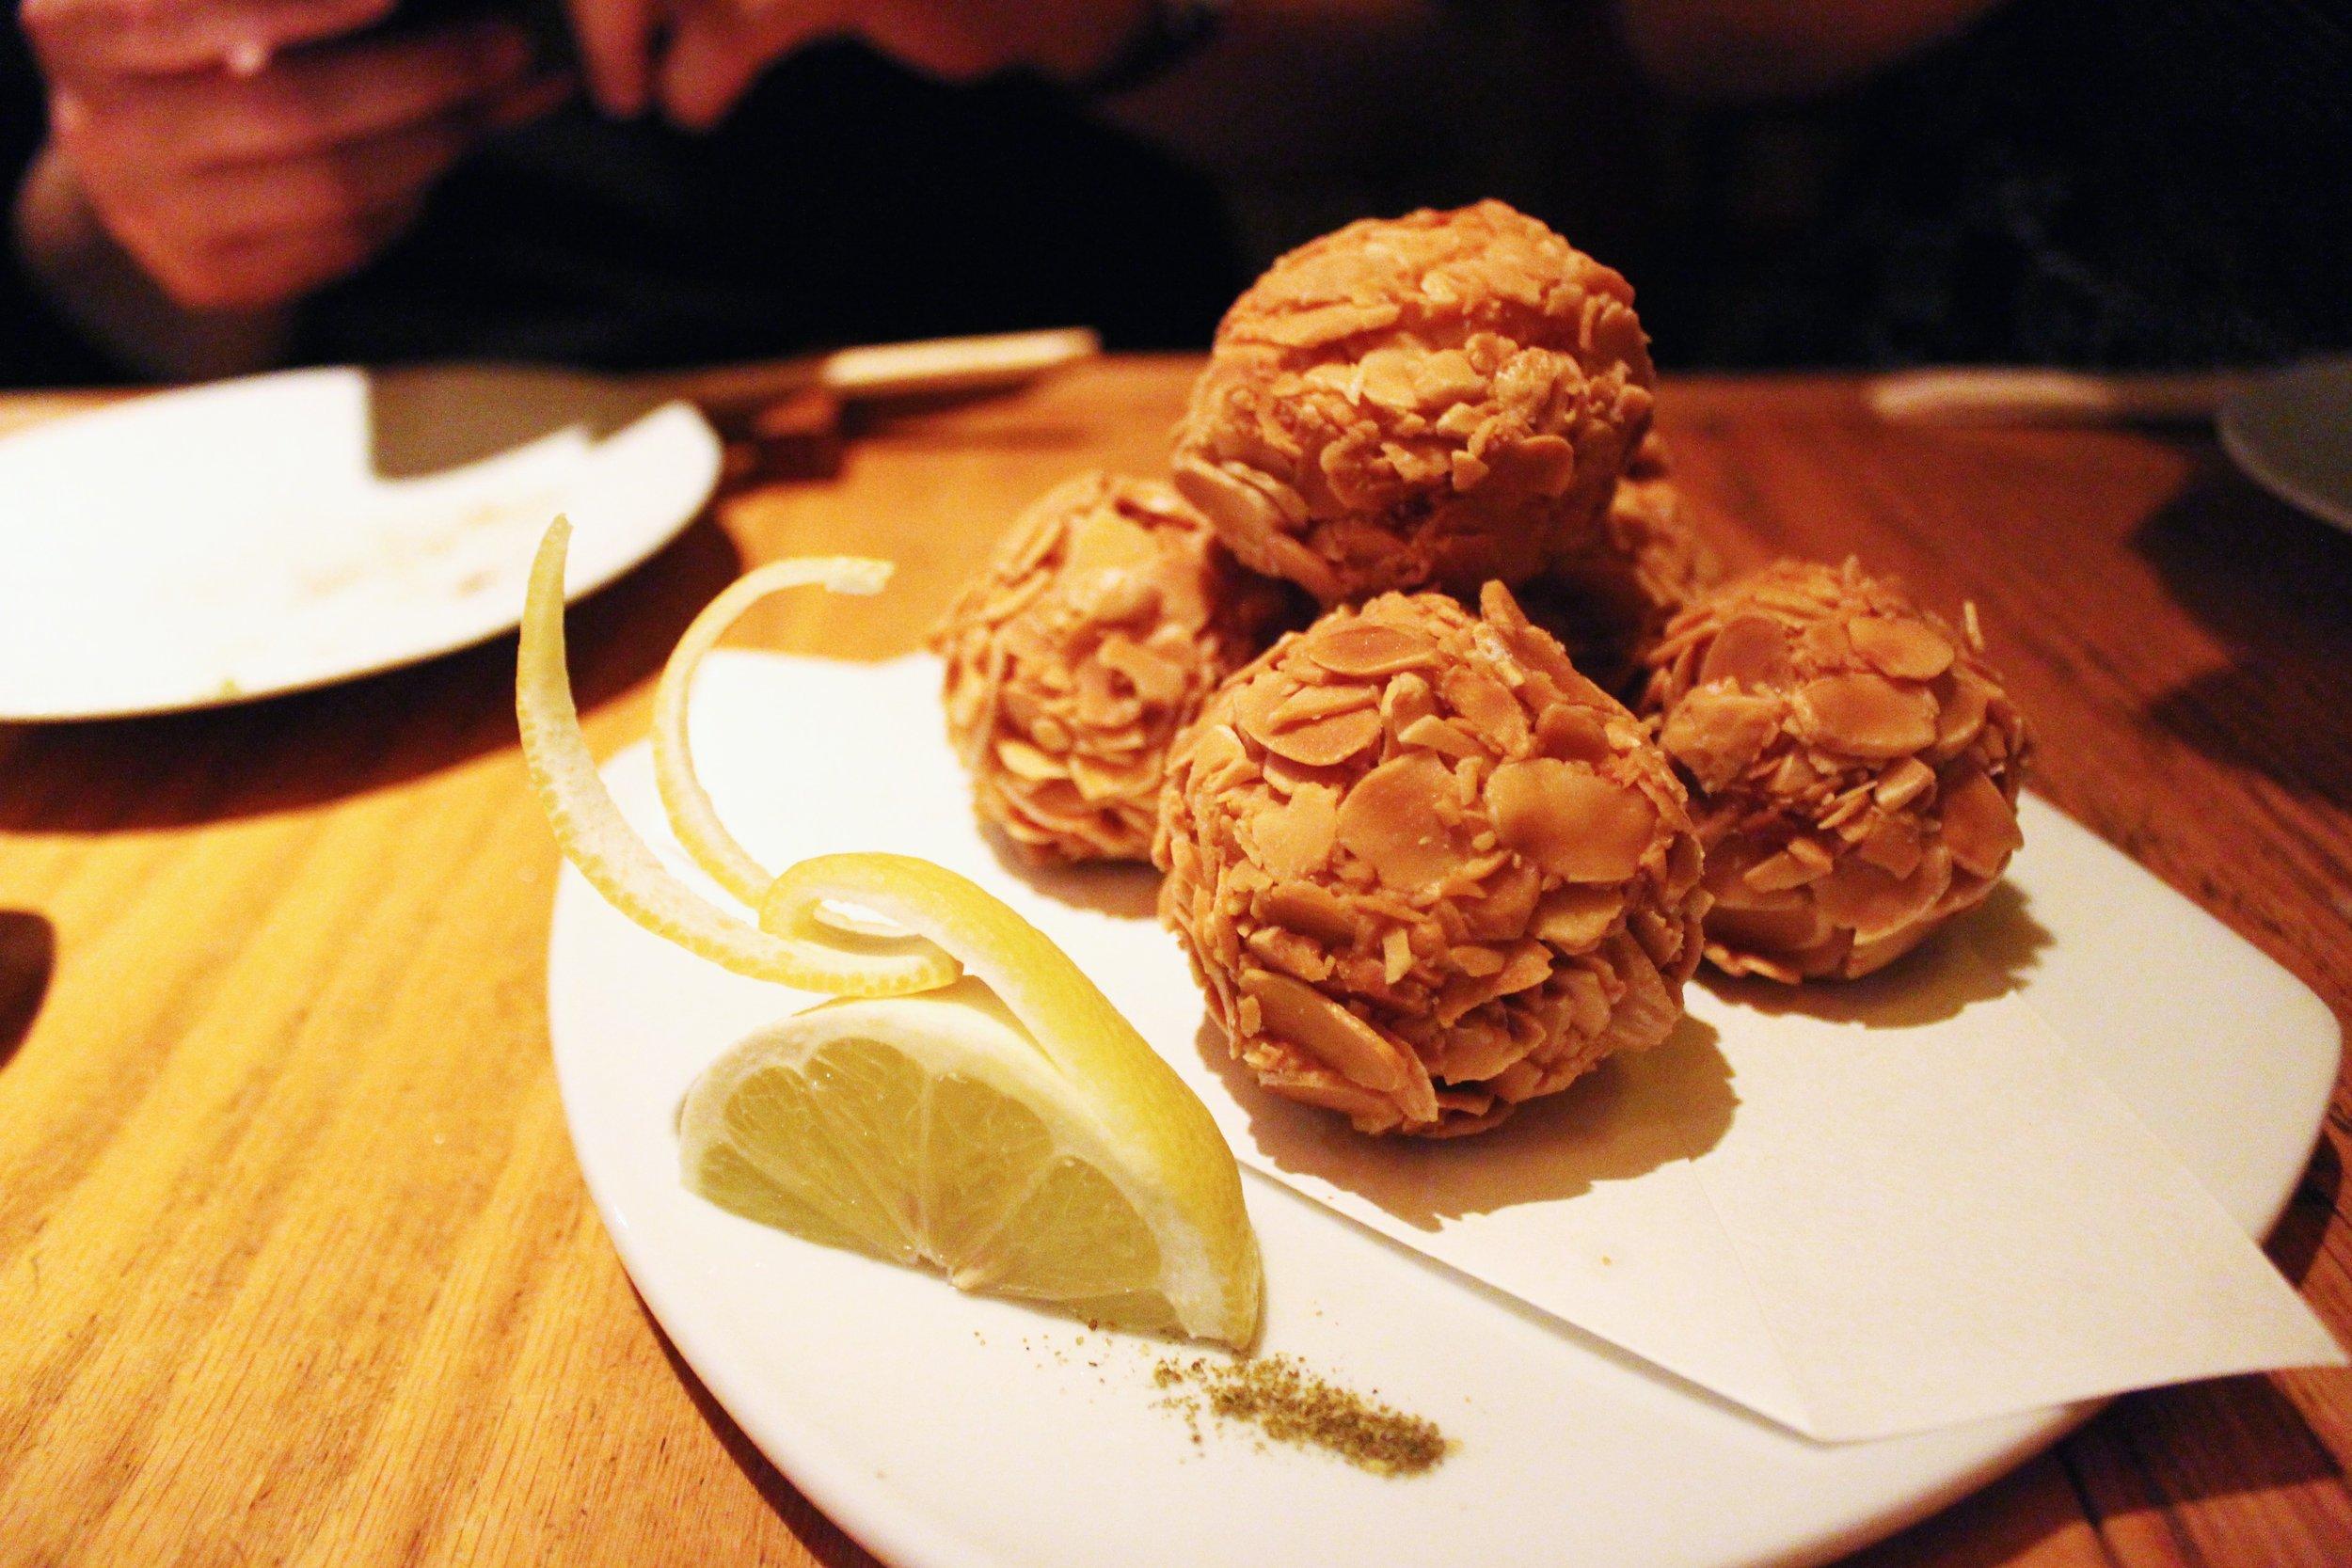 Ebi Shinjo: Deep Fried Shrimp Balls Covered with Sliced Almonds